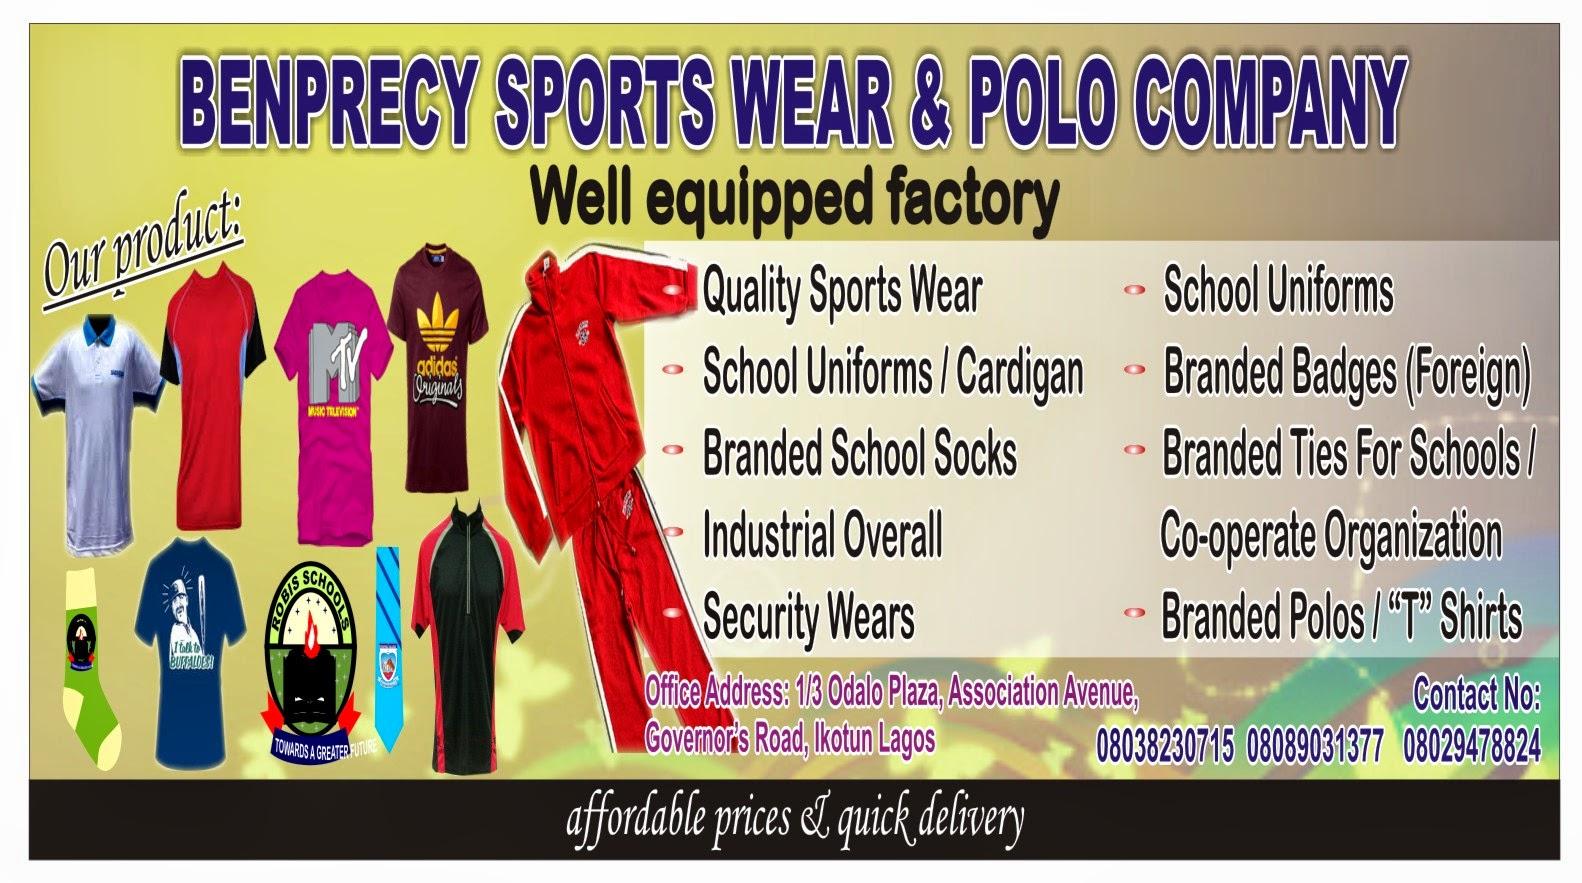 BENPRECY SPORTS WEAR & POLO COMPANY